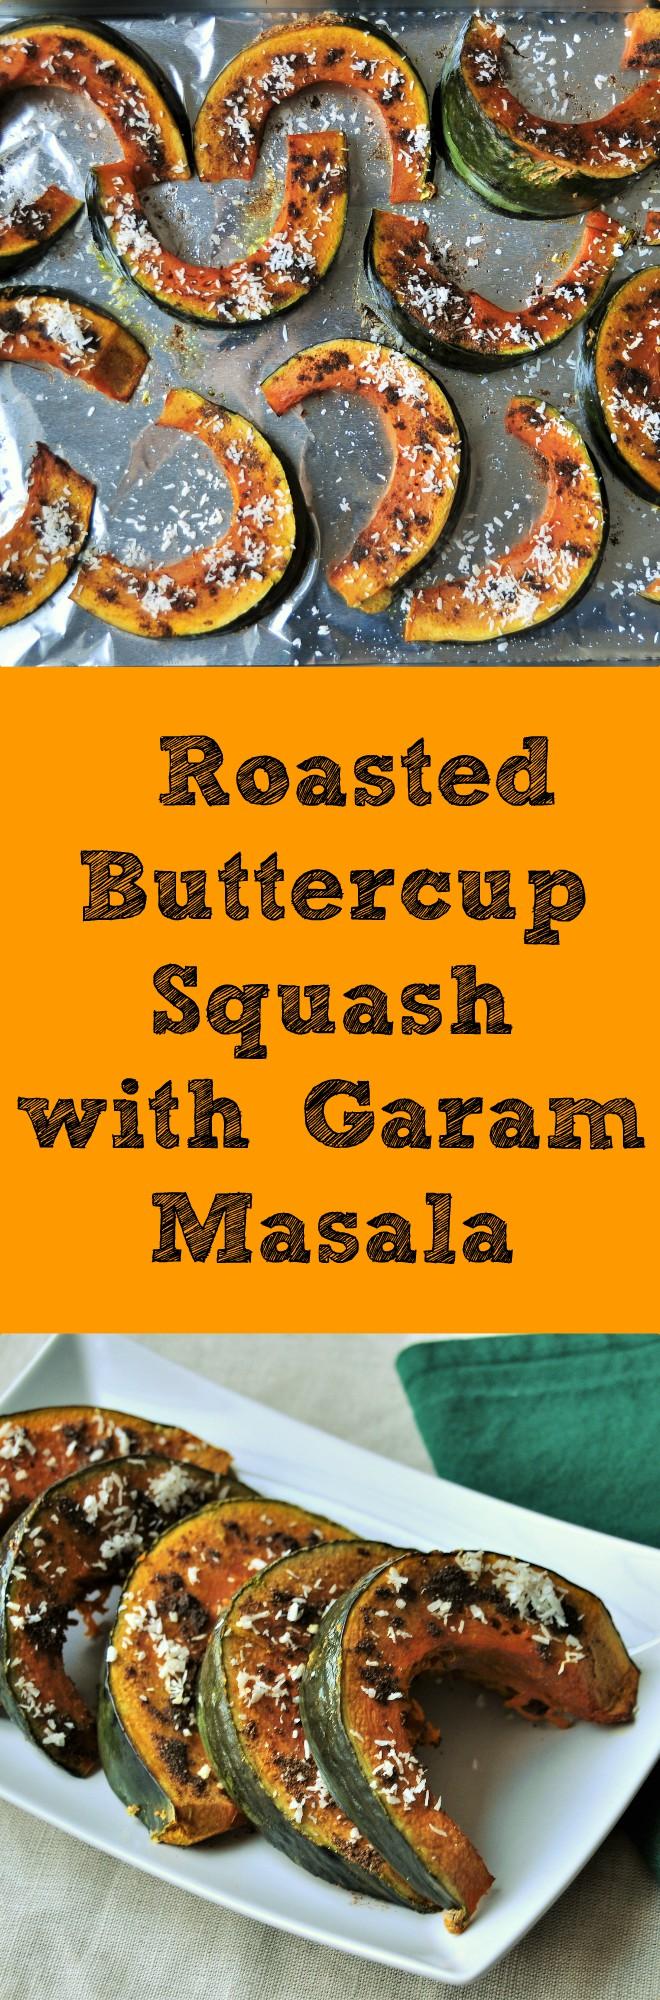 Roasted Buttercup Squash With Garam Masala Easy Gluten Free Vegan Squash Recipe With Coconut Oil Garam M Vegan Squash Recipes Garam Masala Buttercup Squash